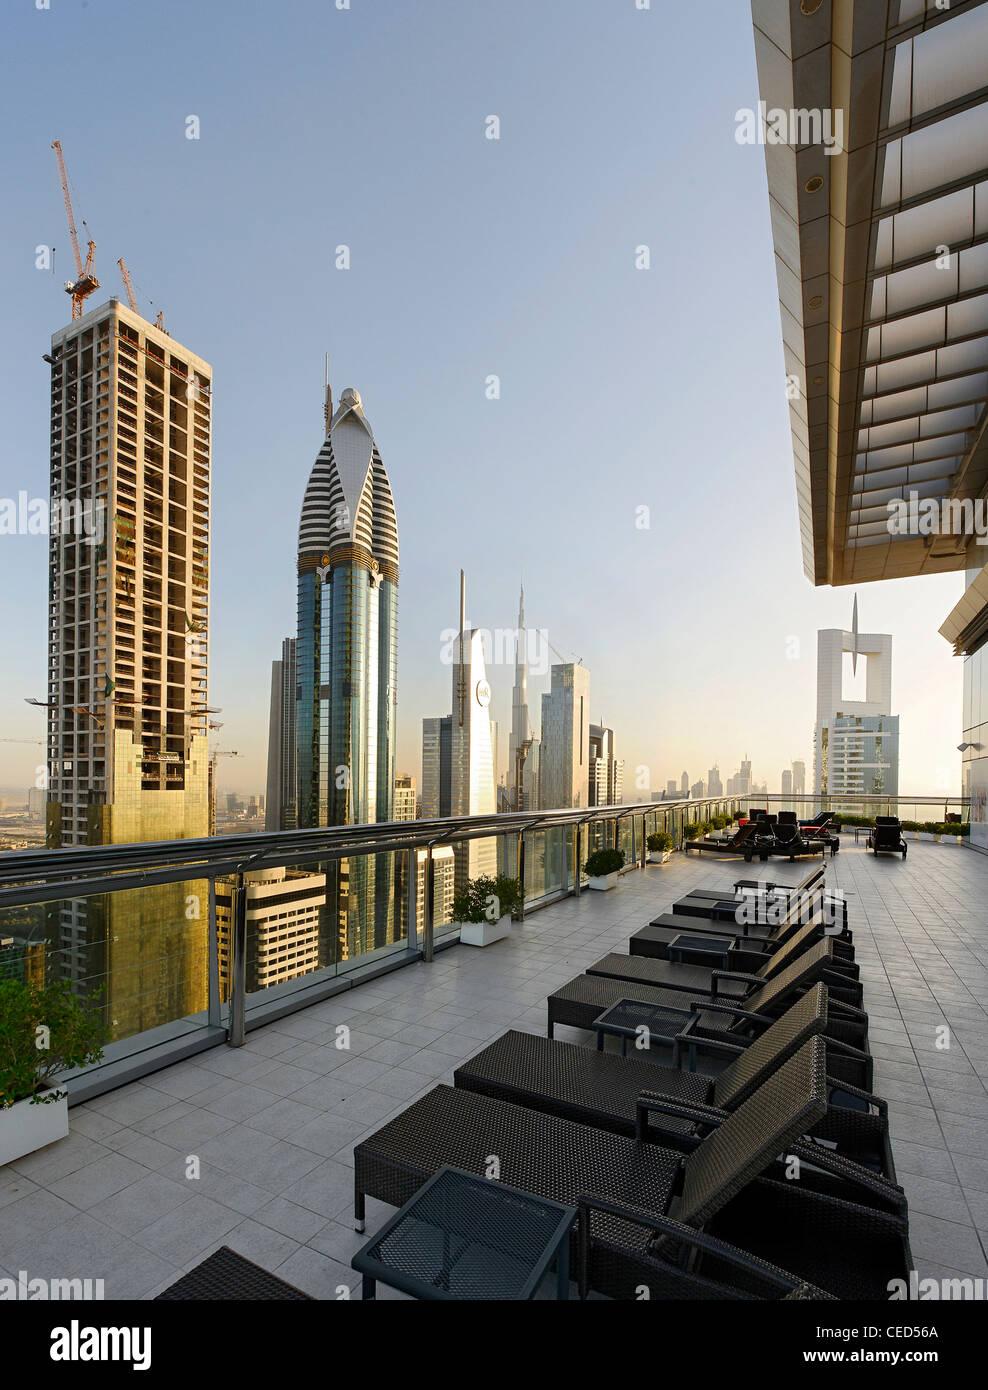 Roof-deck of a hotel, downtown Dubai, Dubai, United Arab Emirates, Middle East - Stock Image